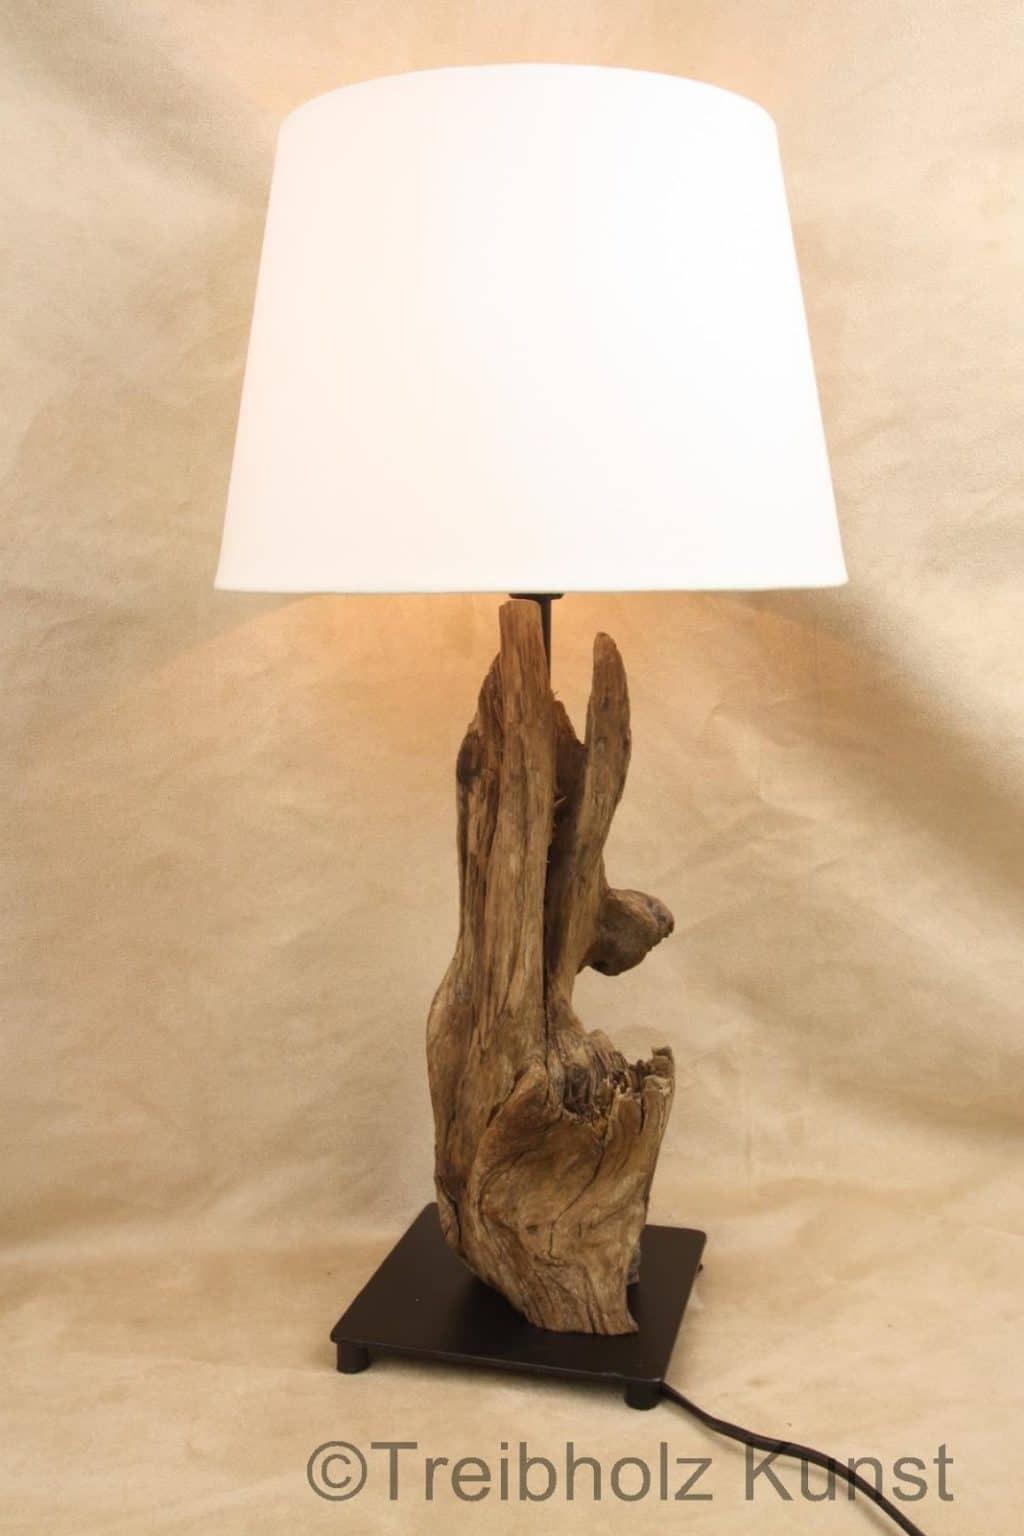 Einzigartige Treibholz-Lampen zum selber bauen - Woodstoneart